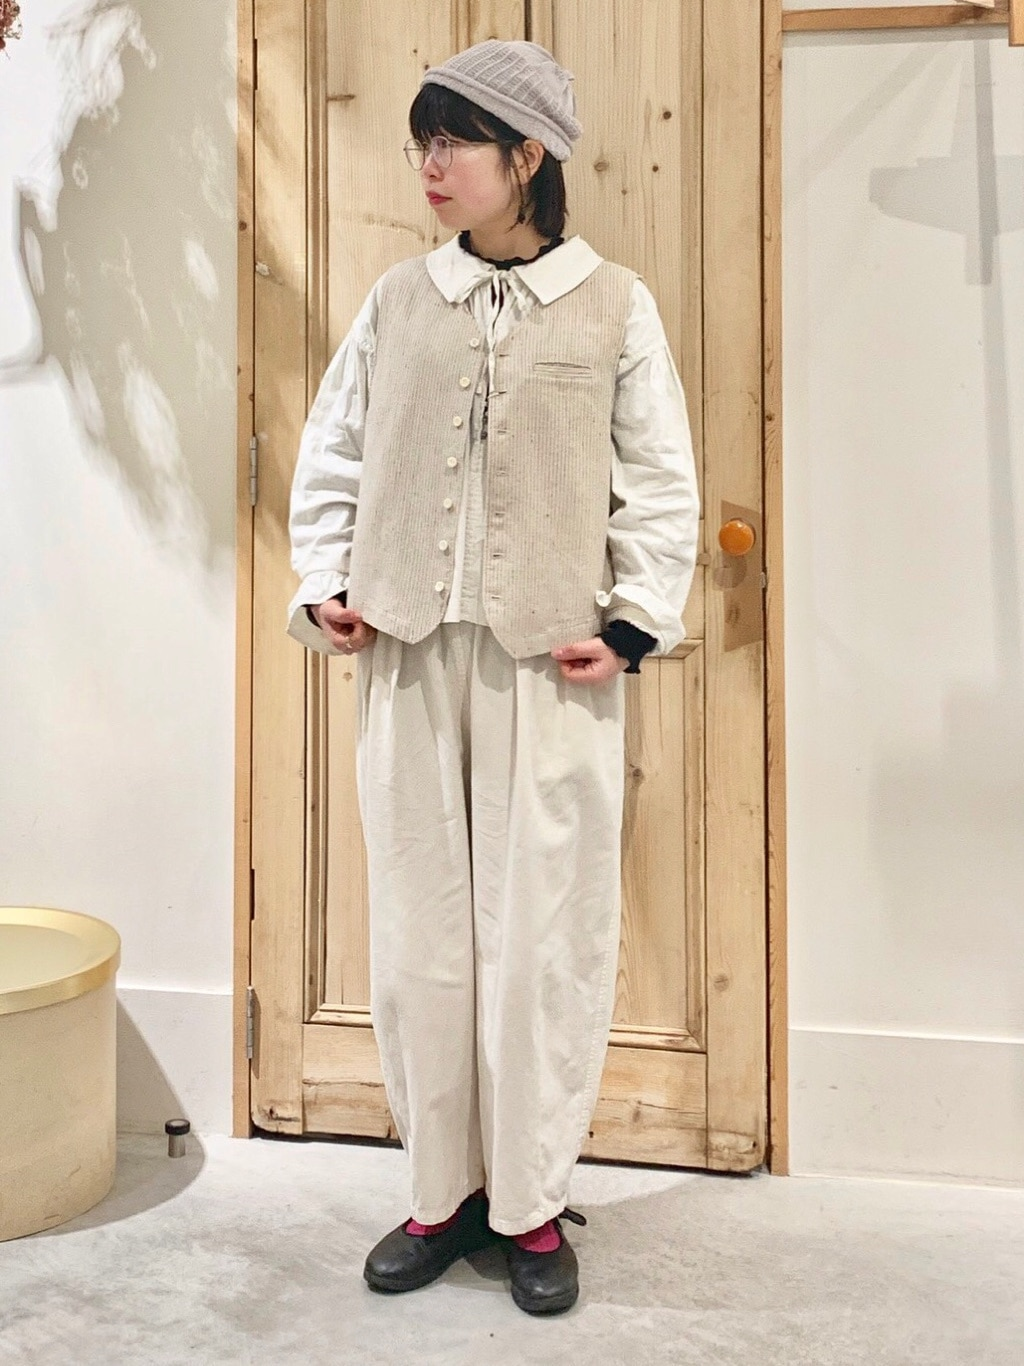 Malle chambre de charme 調布パルコ 身長:153cm 2021.01.27